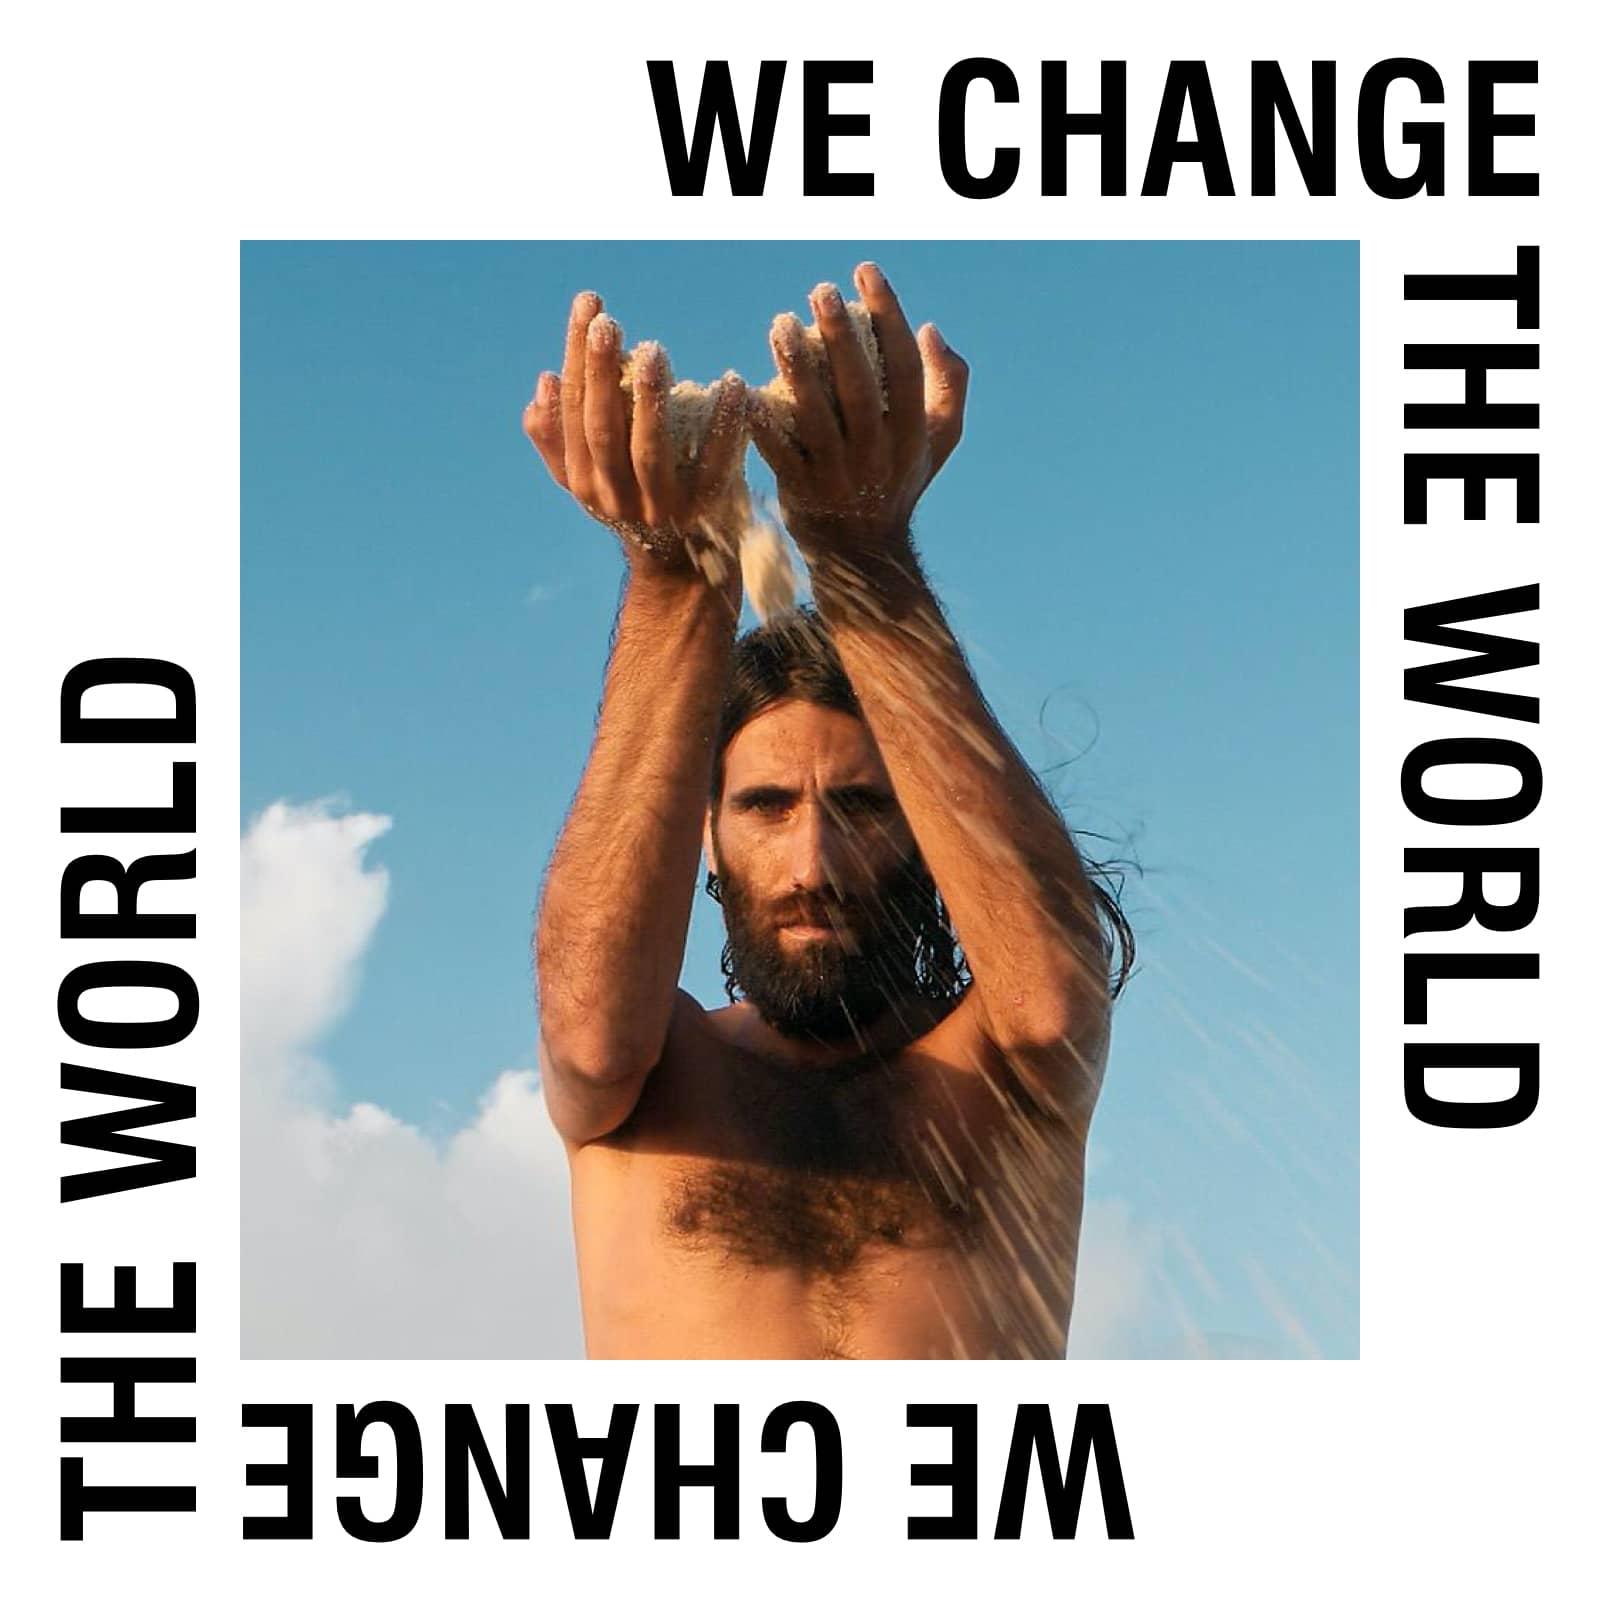 We Change the World